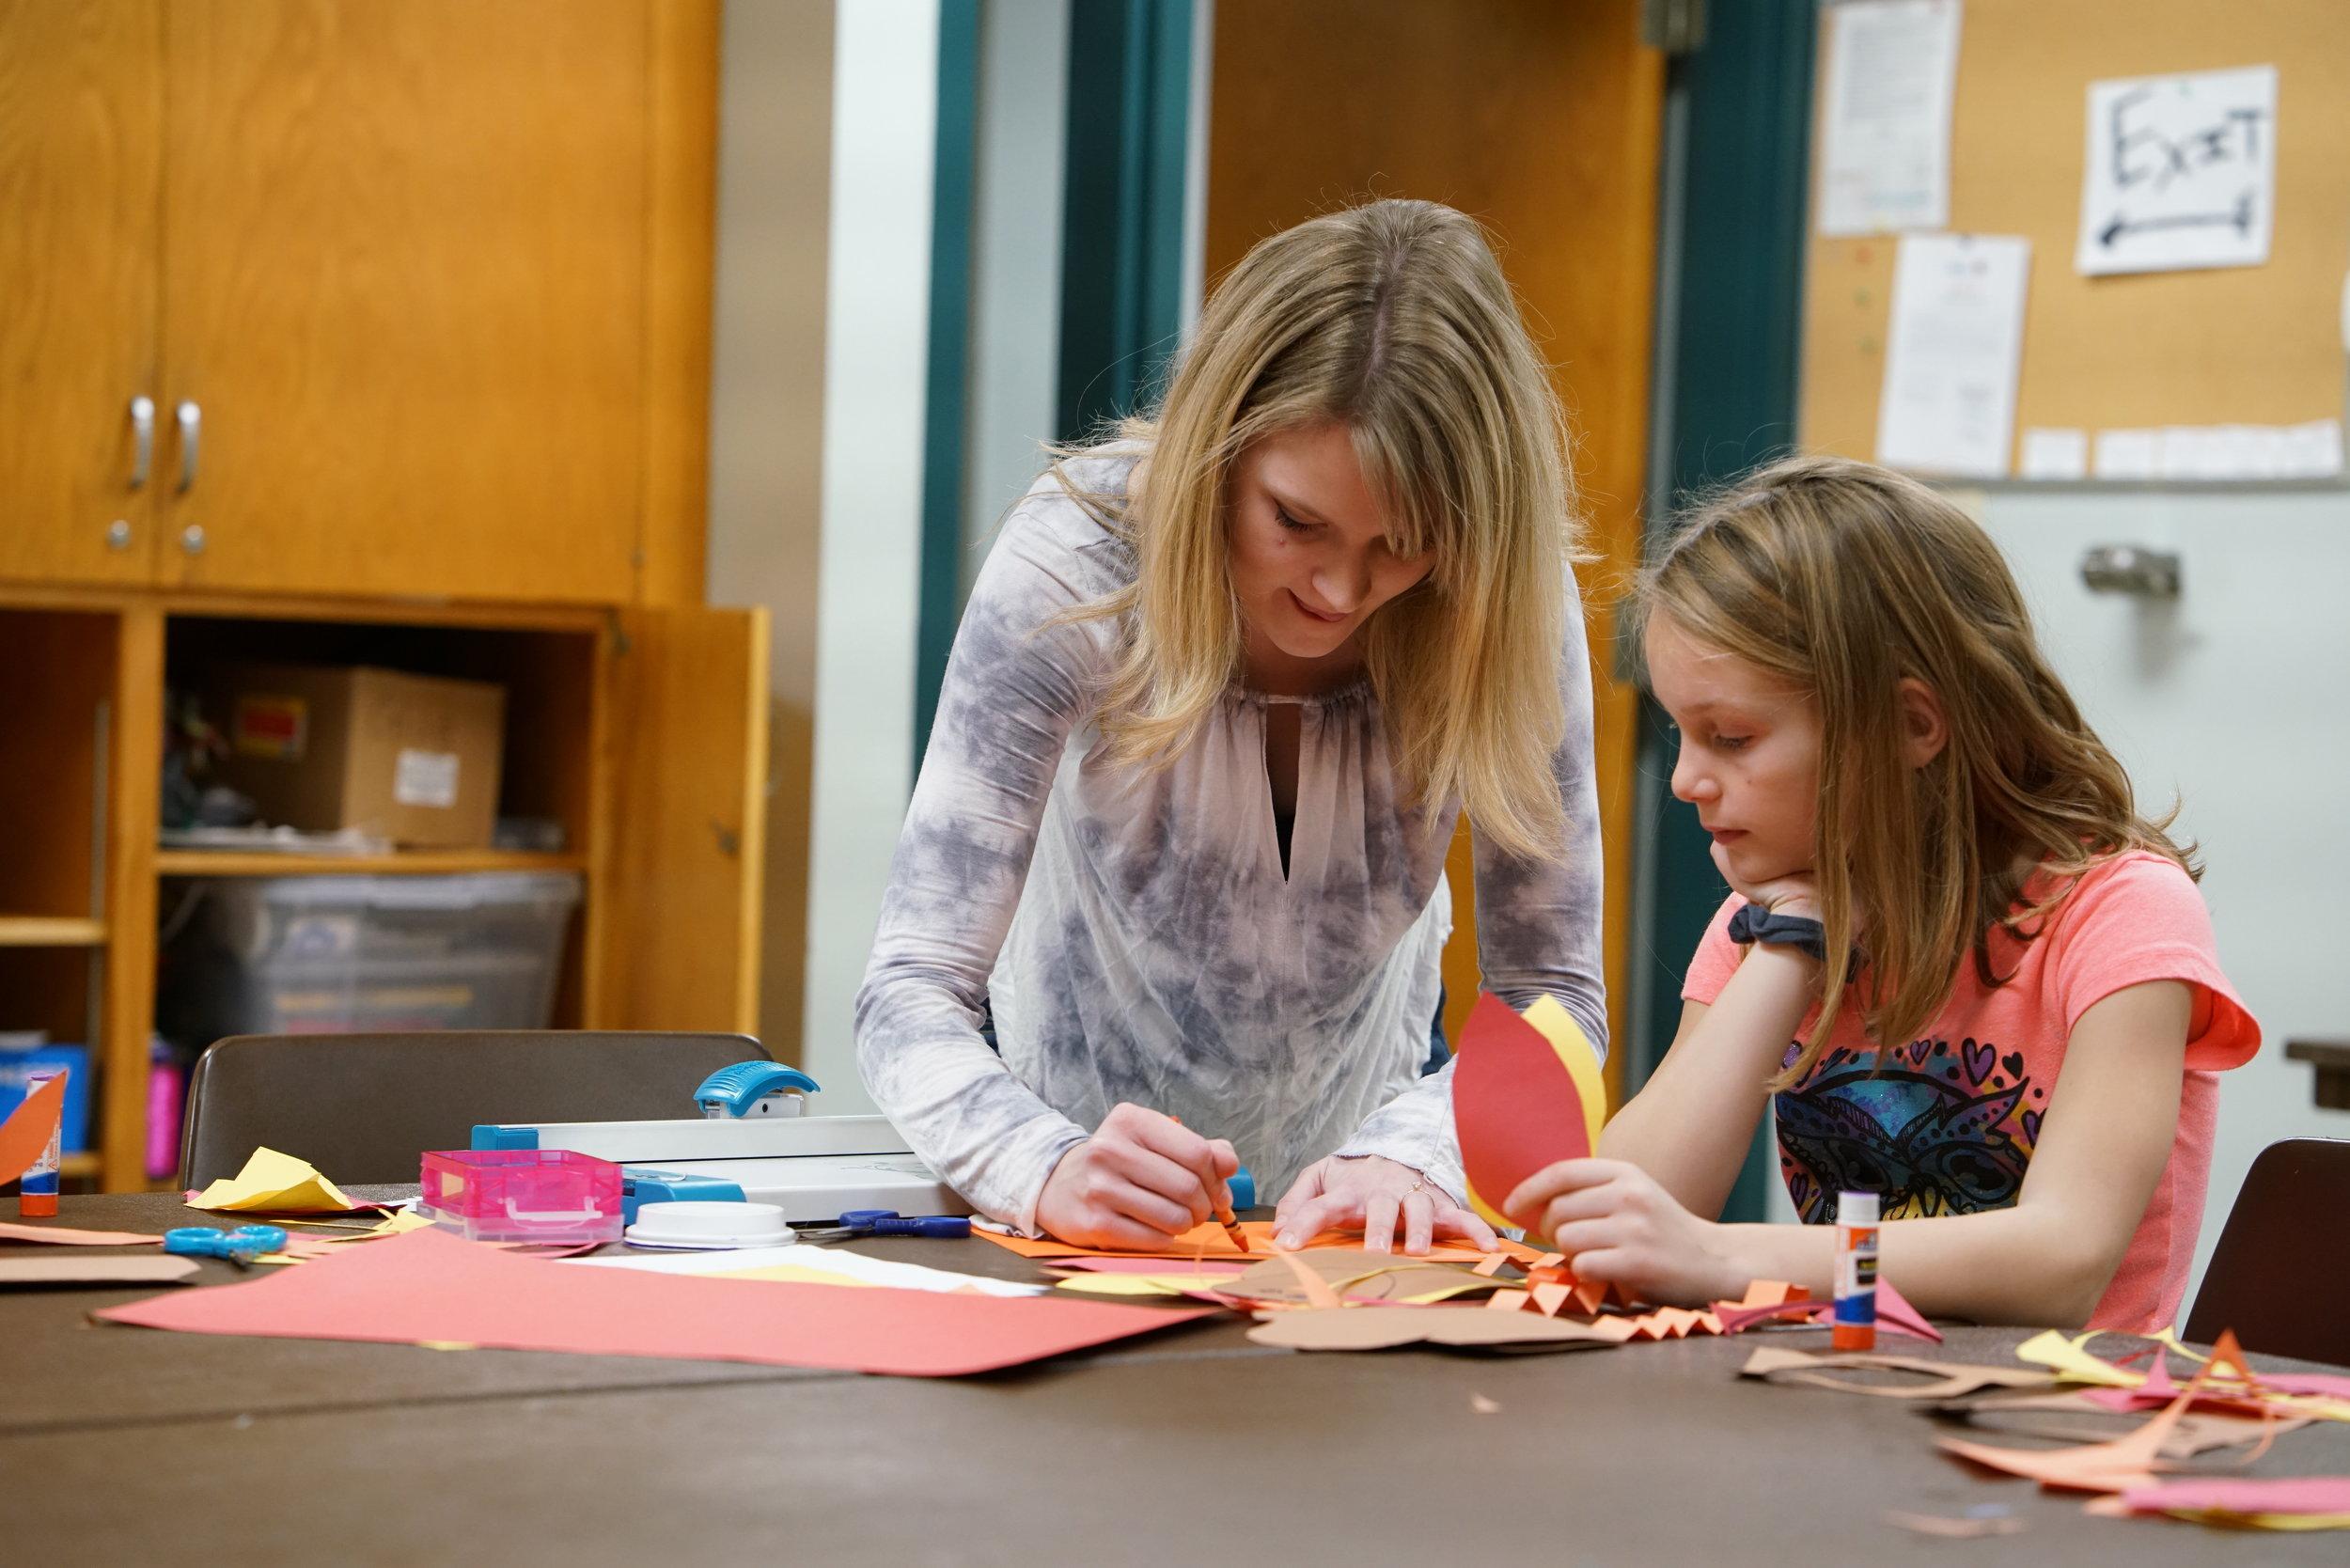 MARISSA PILNEY , UW-STOUT EARLY CHILDHOOD EDUCATION INTERNSHIP: Jumpstart Afterschool Program (K-5 Art Classes), Menomonie Parks and Recreation Department